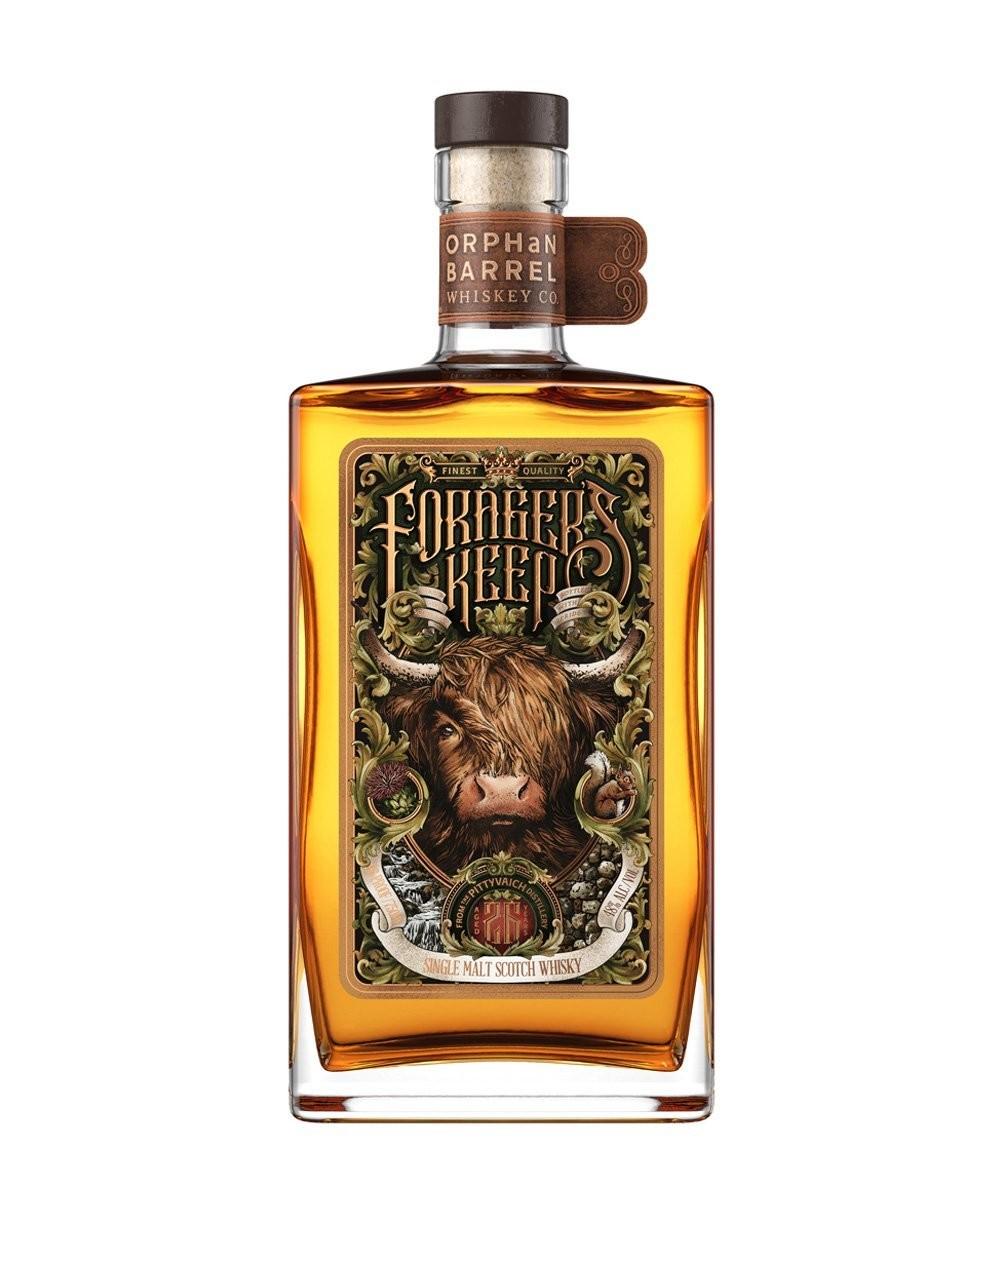 Orphan Barrel Forager's Keep 26 Year Old Single Malt Scotch Whisky, Speyside (750 ml)